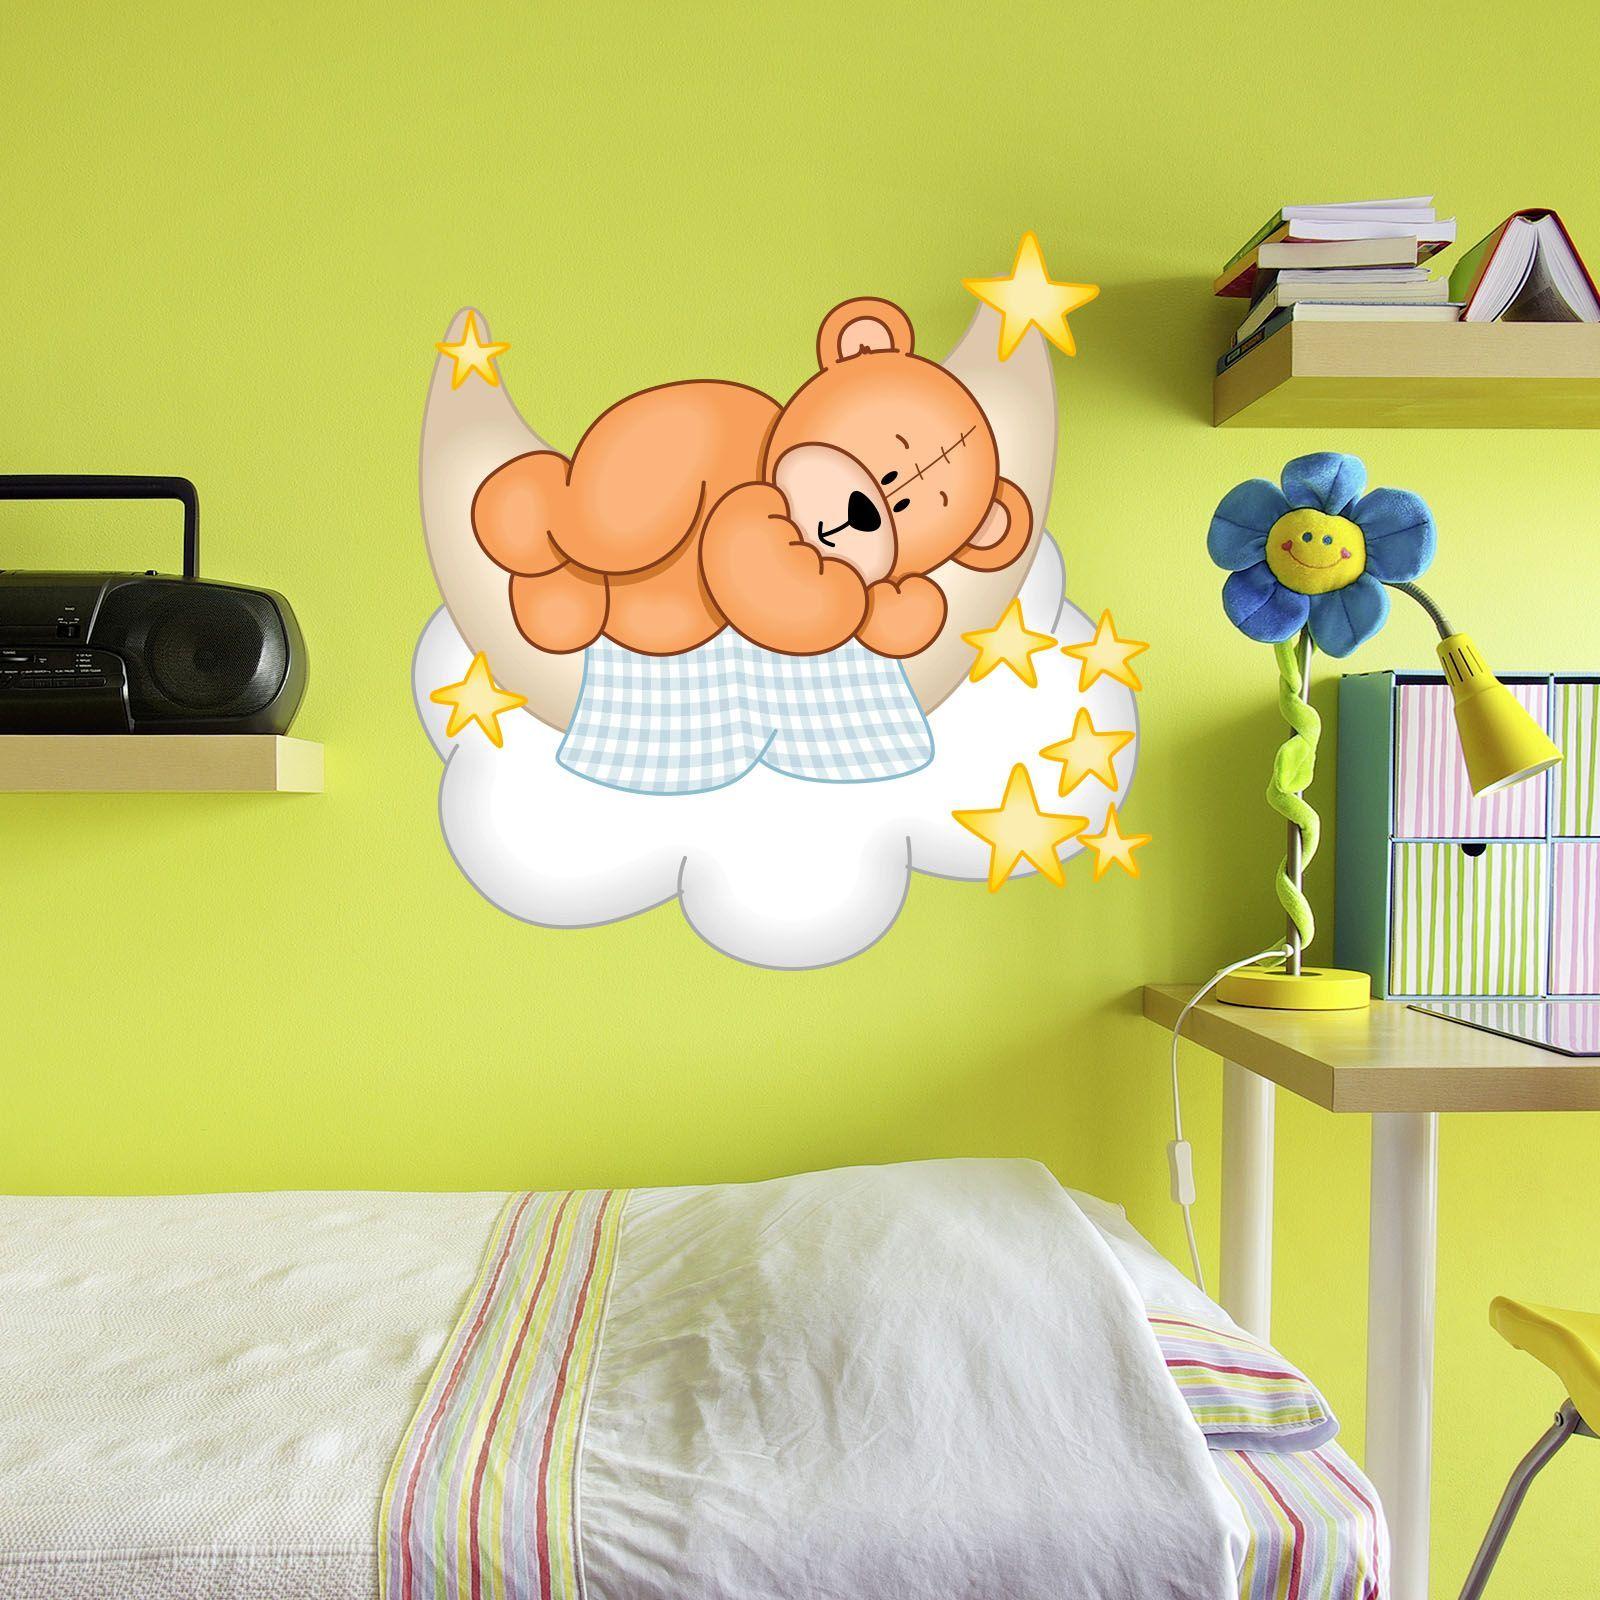 Xxl Wallprint Wandtattoo Teddy B R Mond Wolken Schlummerland Kinder Zimmer Kindersachen